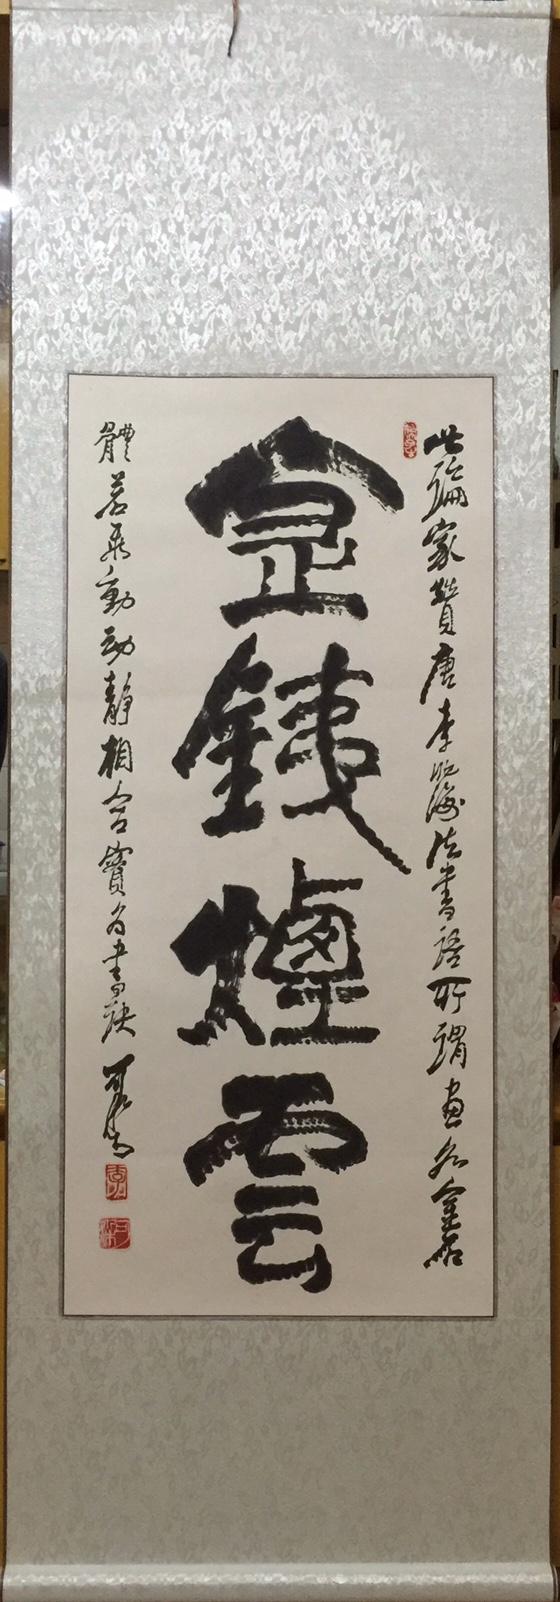 Li Keran(1907-1989), Calligraphy